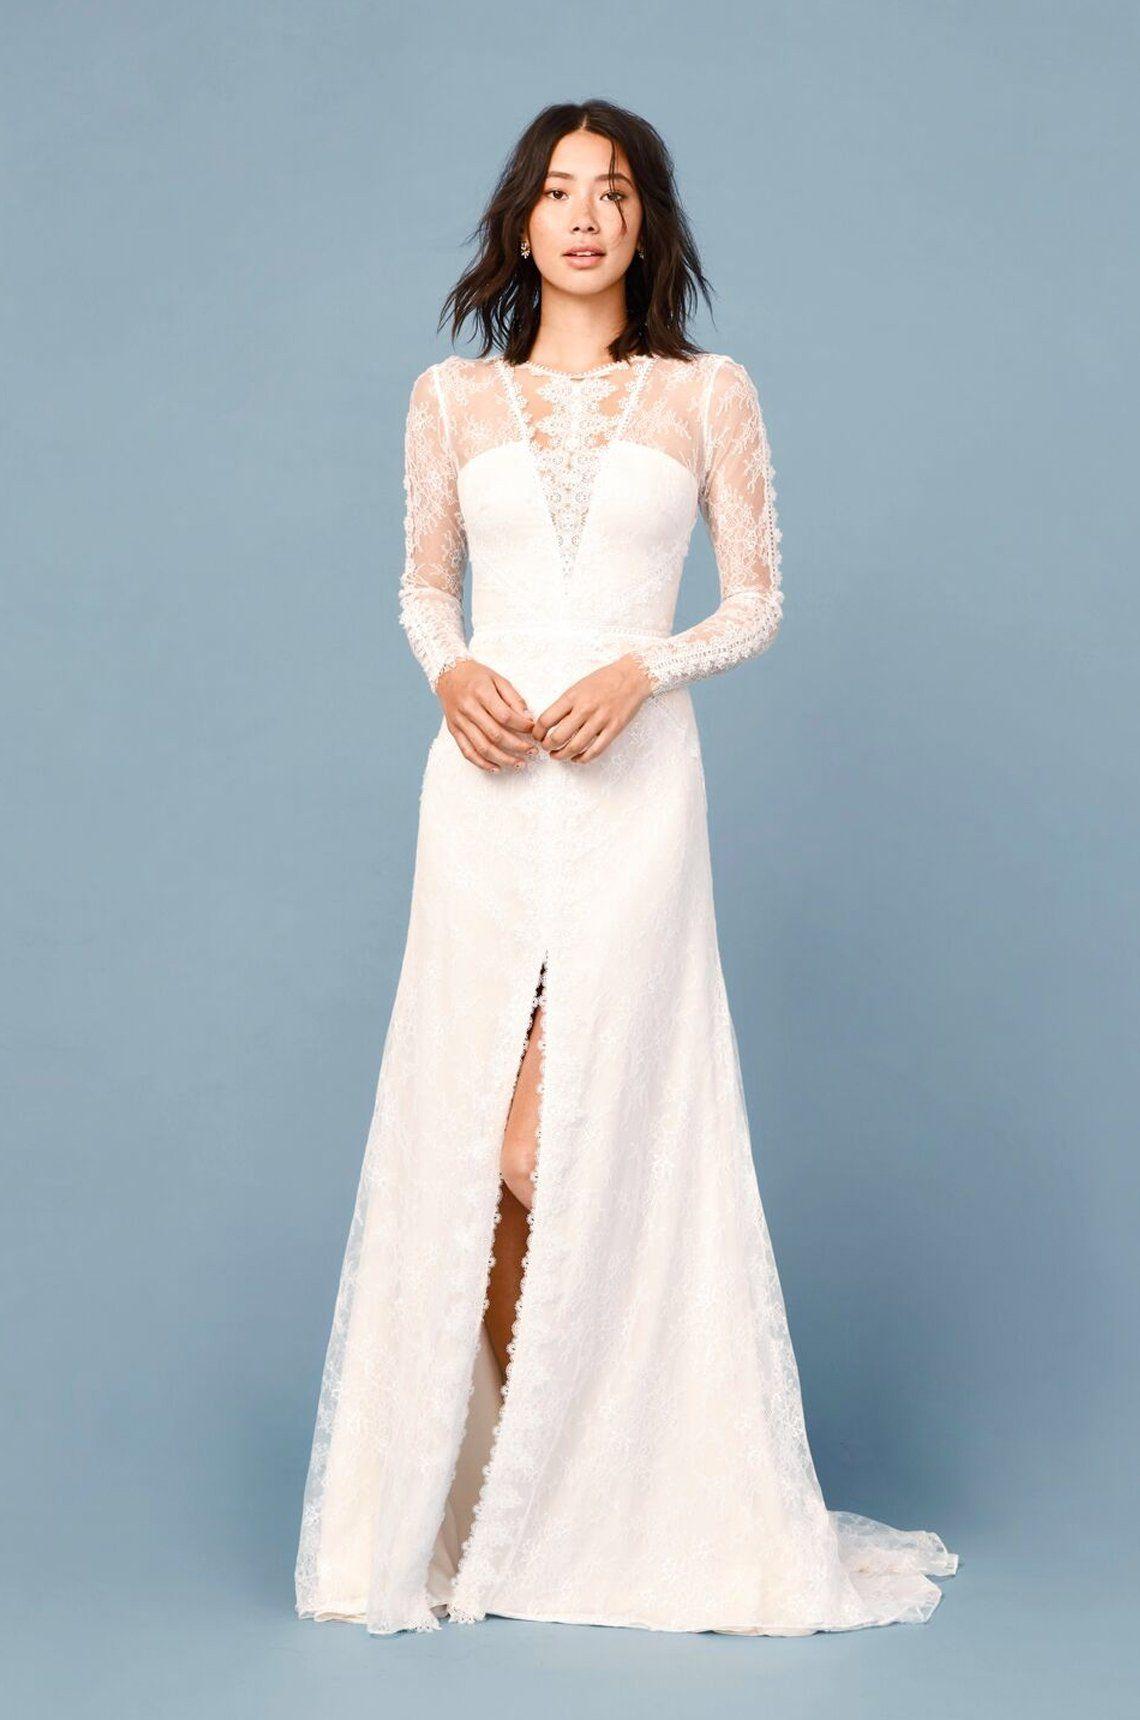 J jones in wedding ideas pinterest wedding dresses